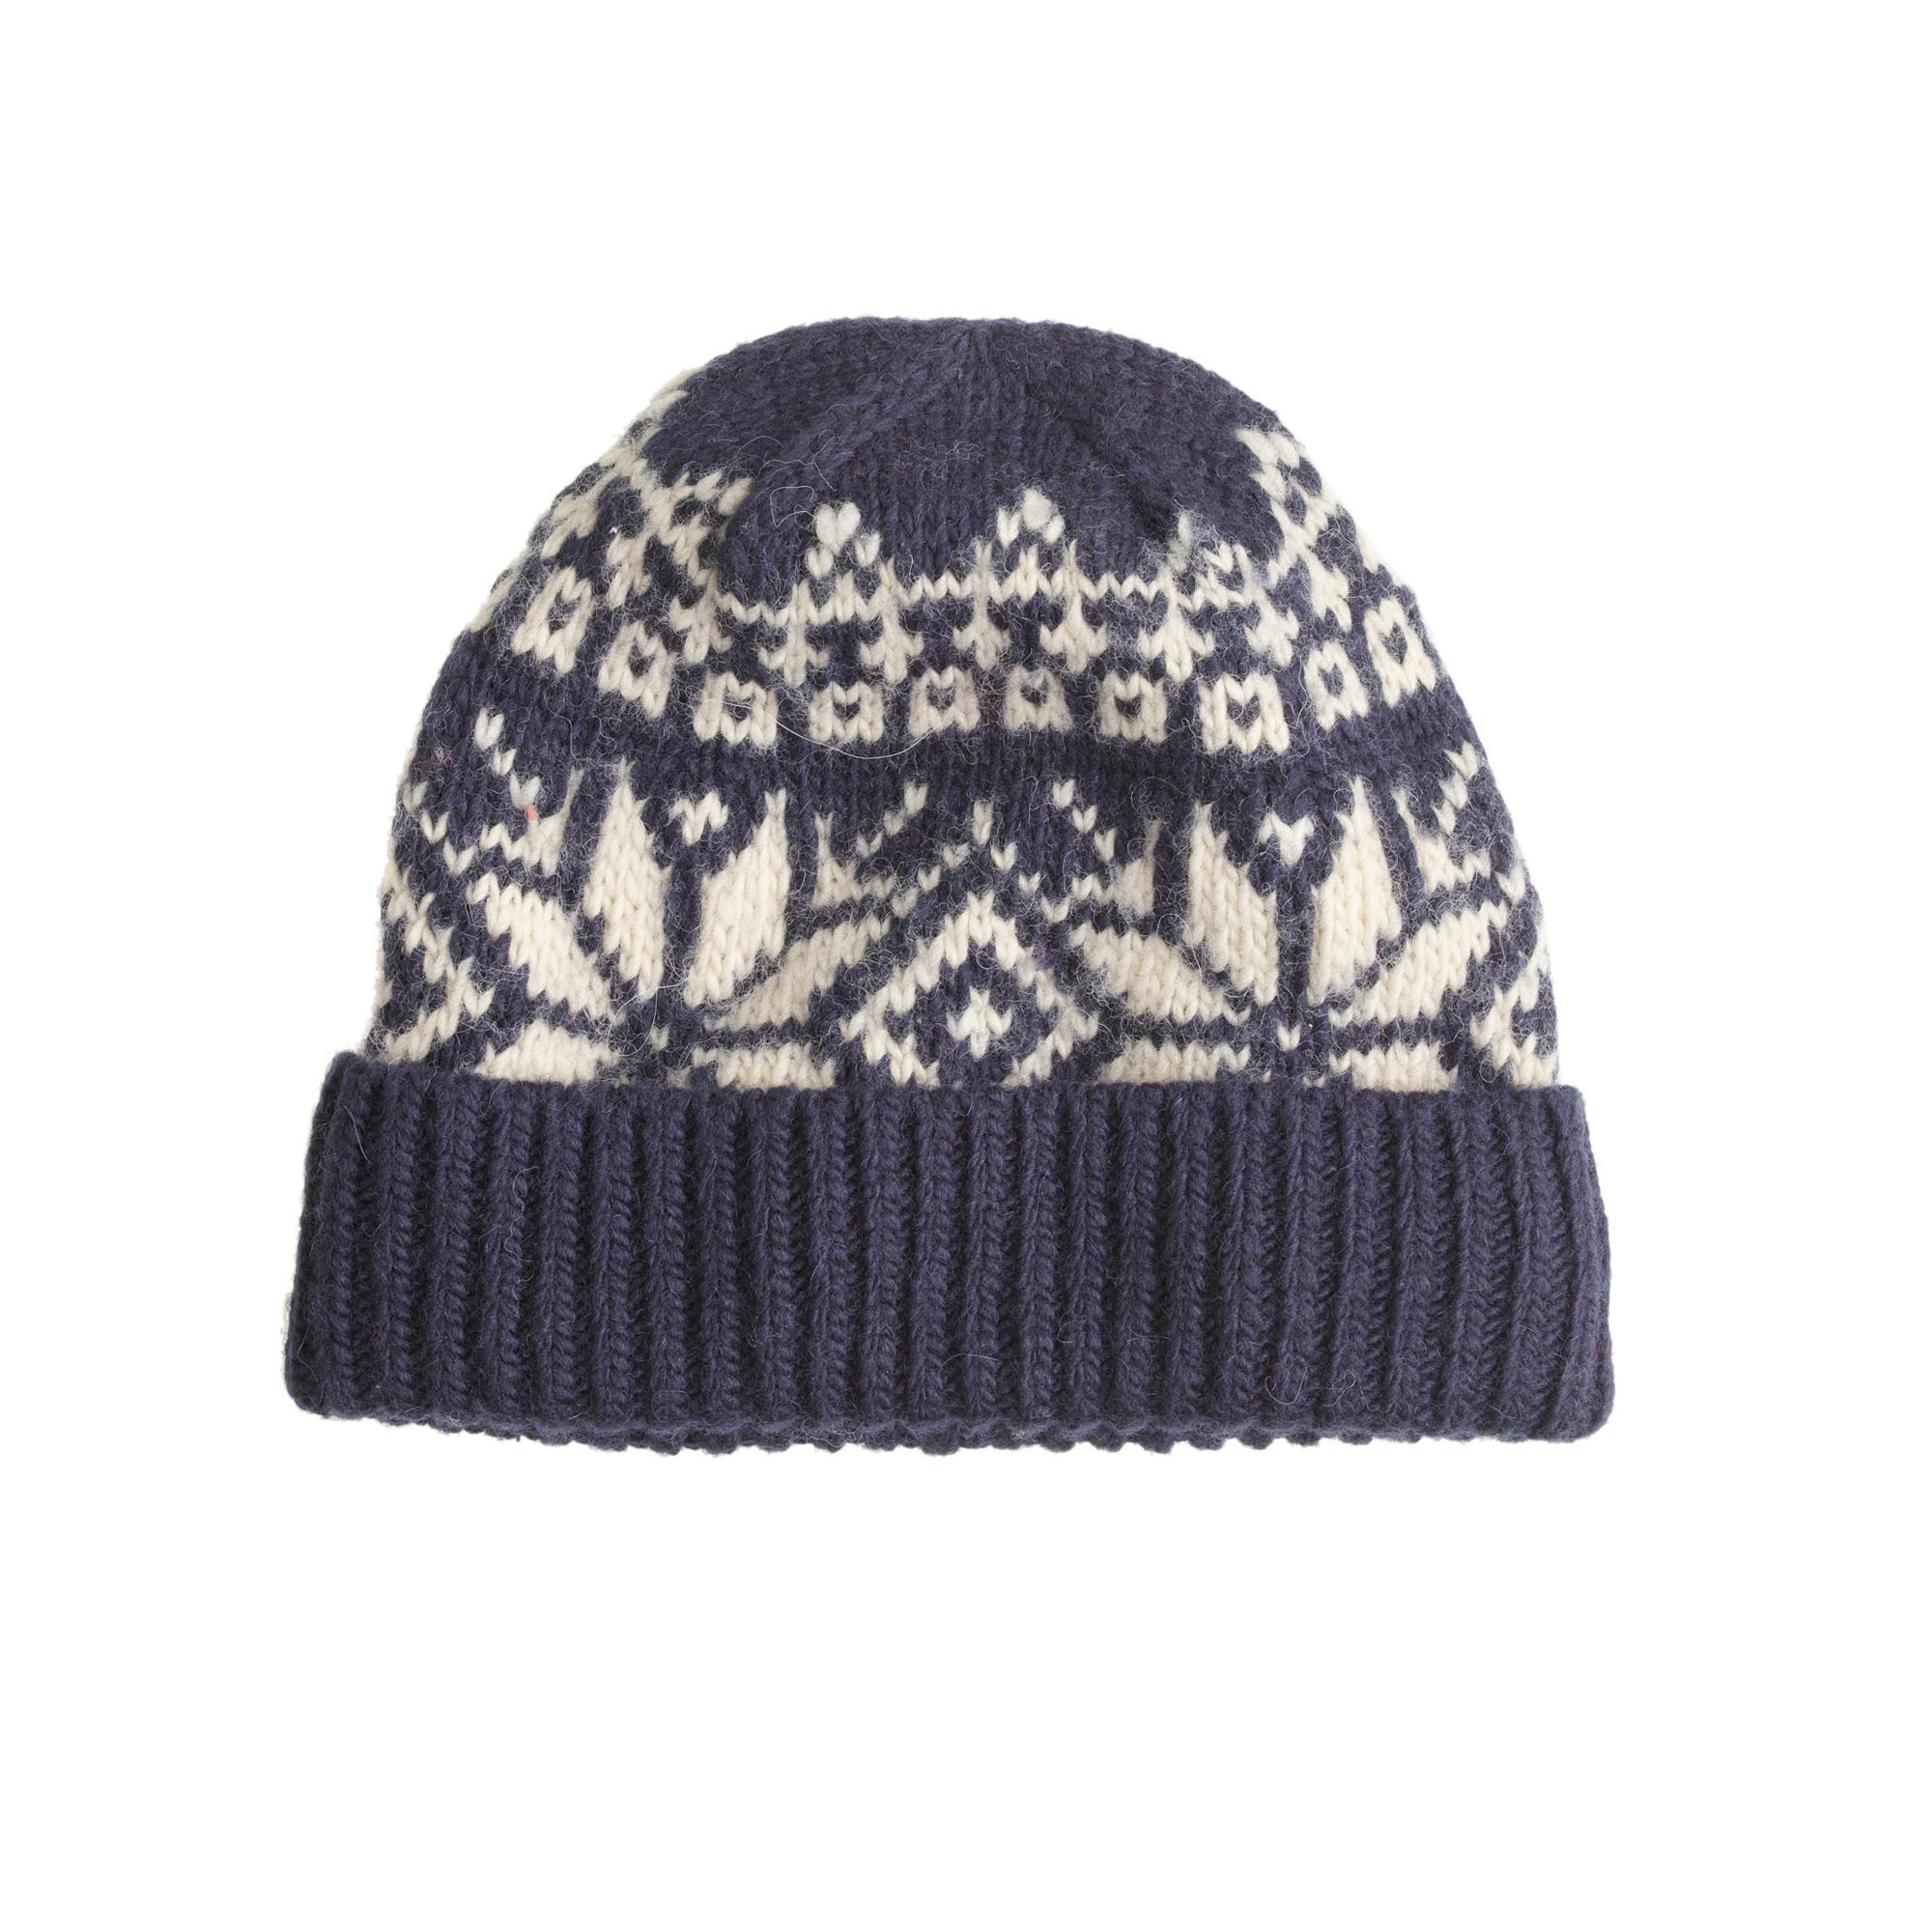 Knitting Pattern For Alpaca Hat